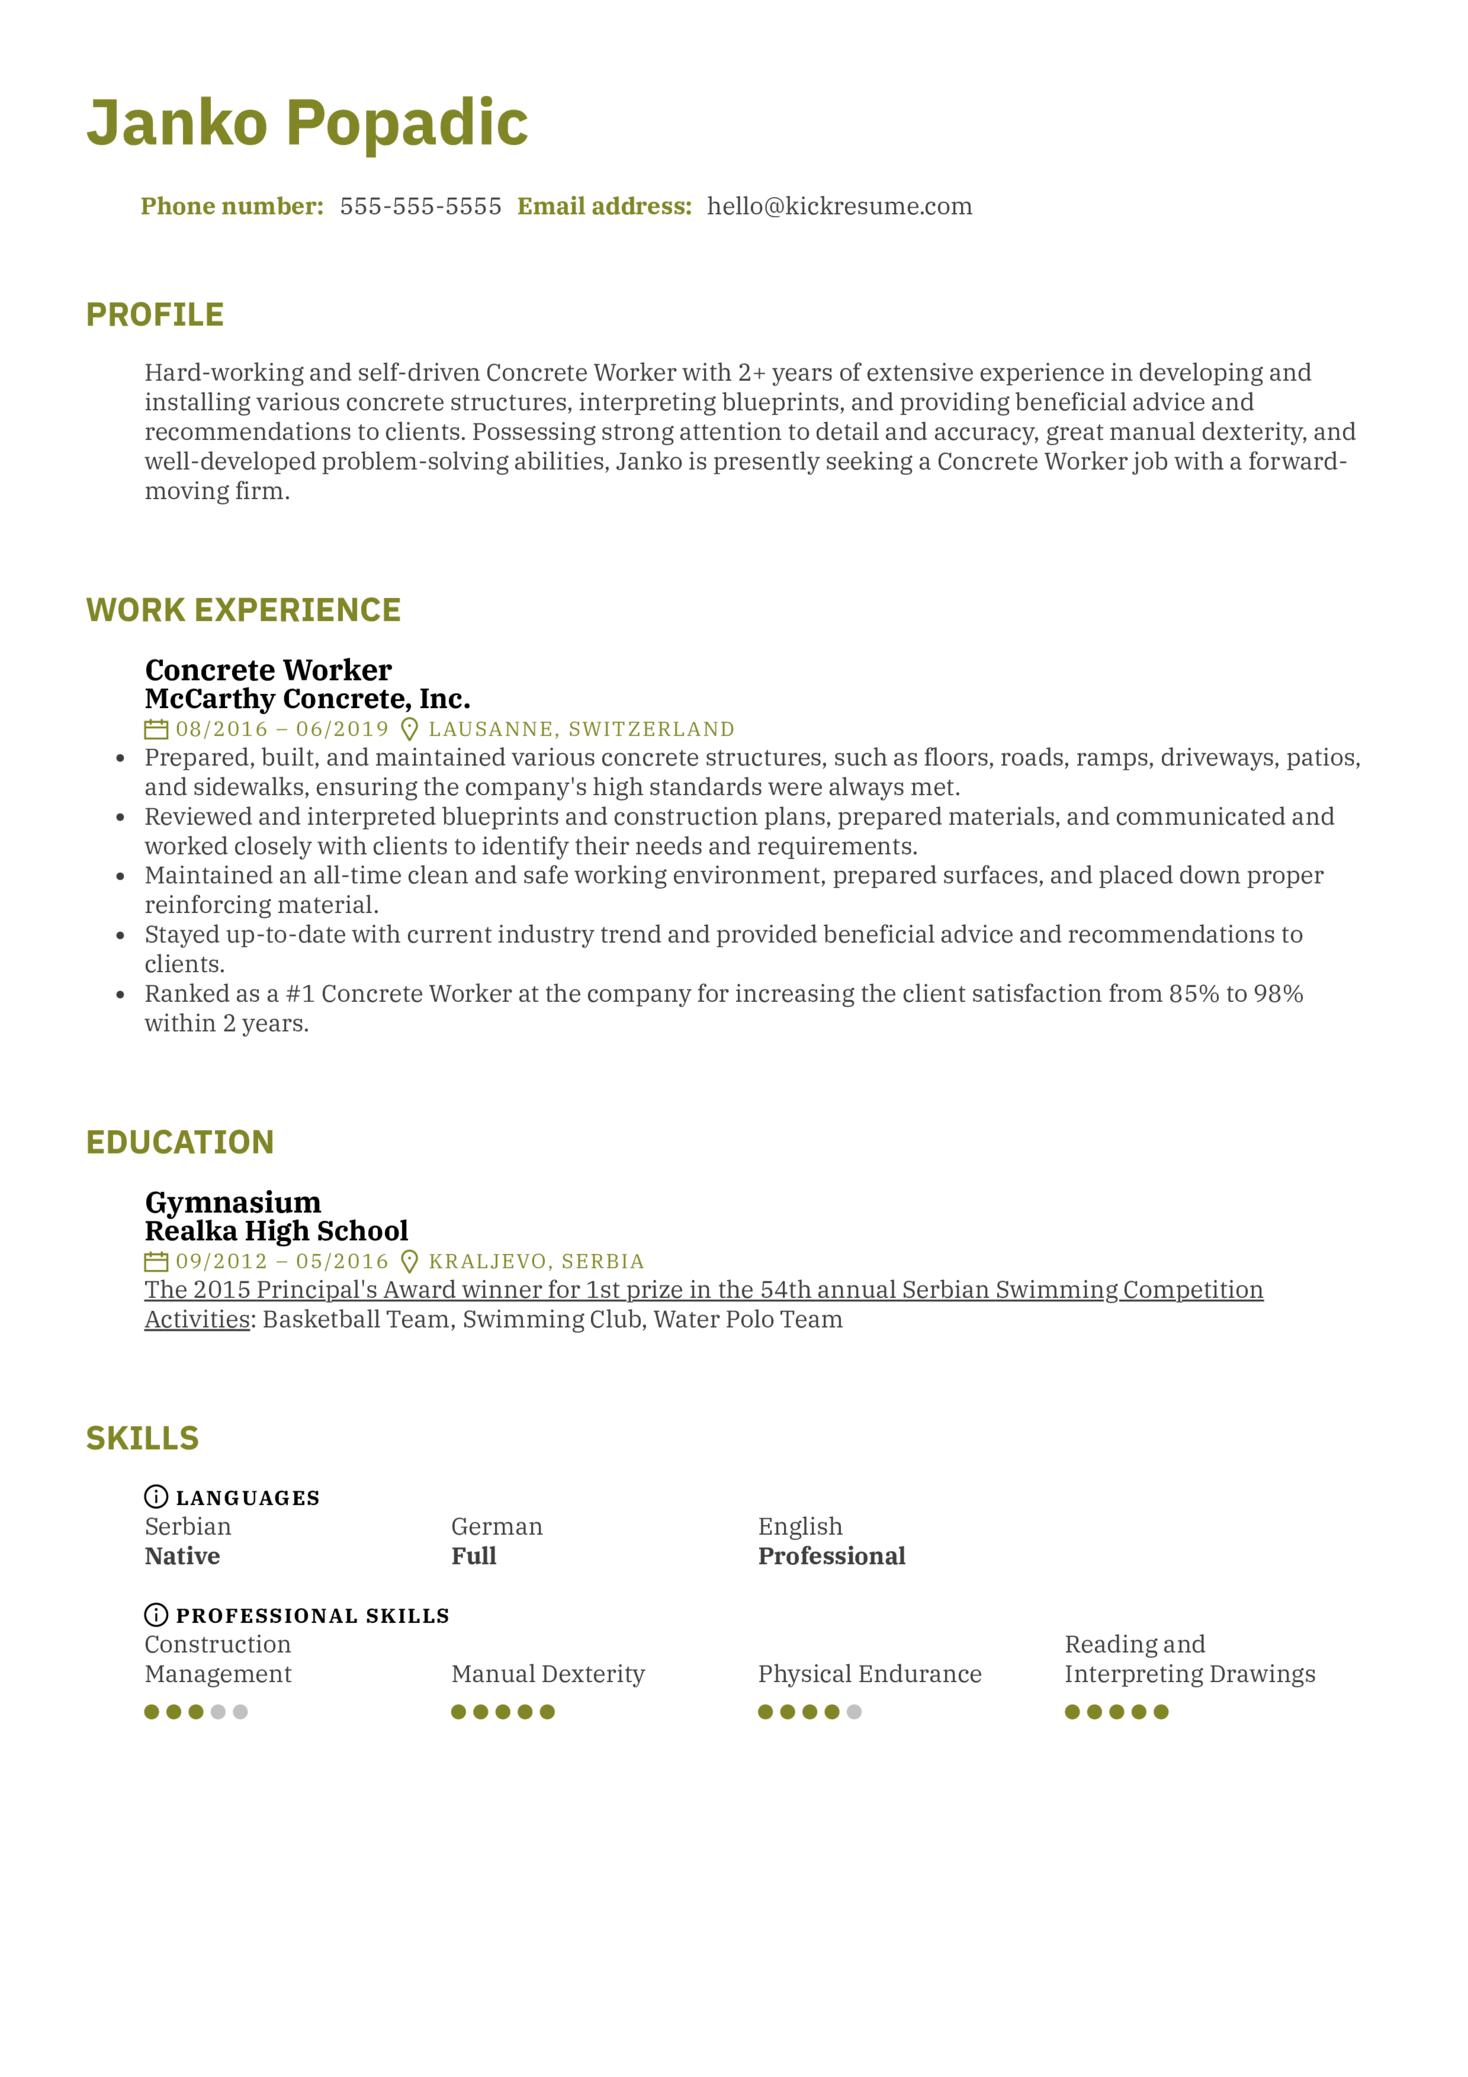 Concrete Worker Resume Sample (parte 1)